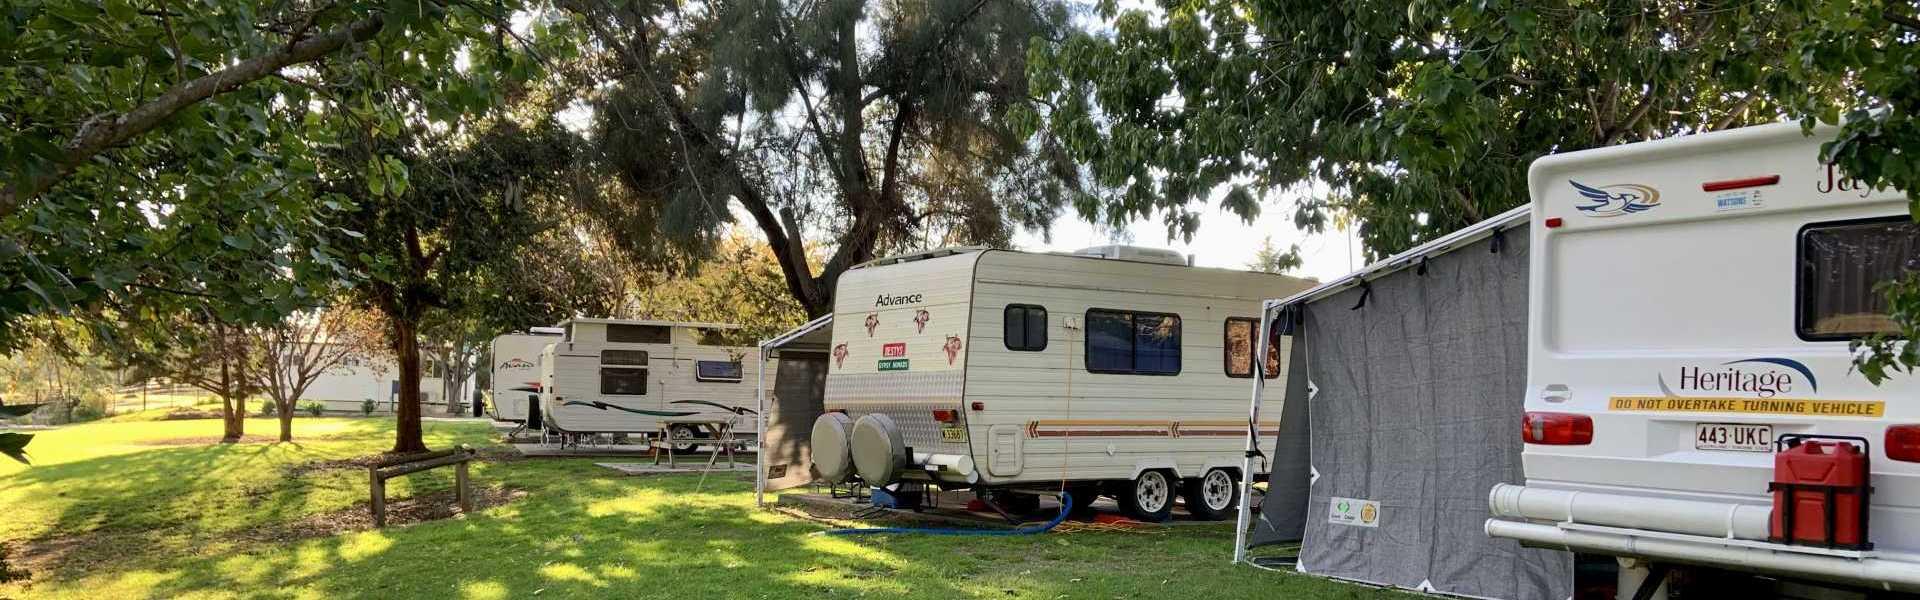 inverell caravan park 05 2021